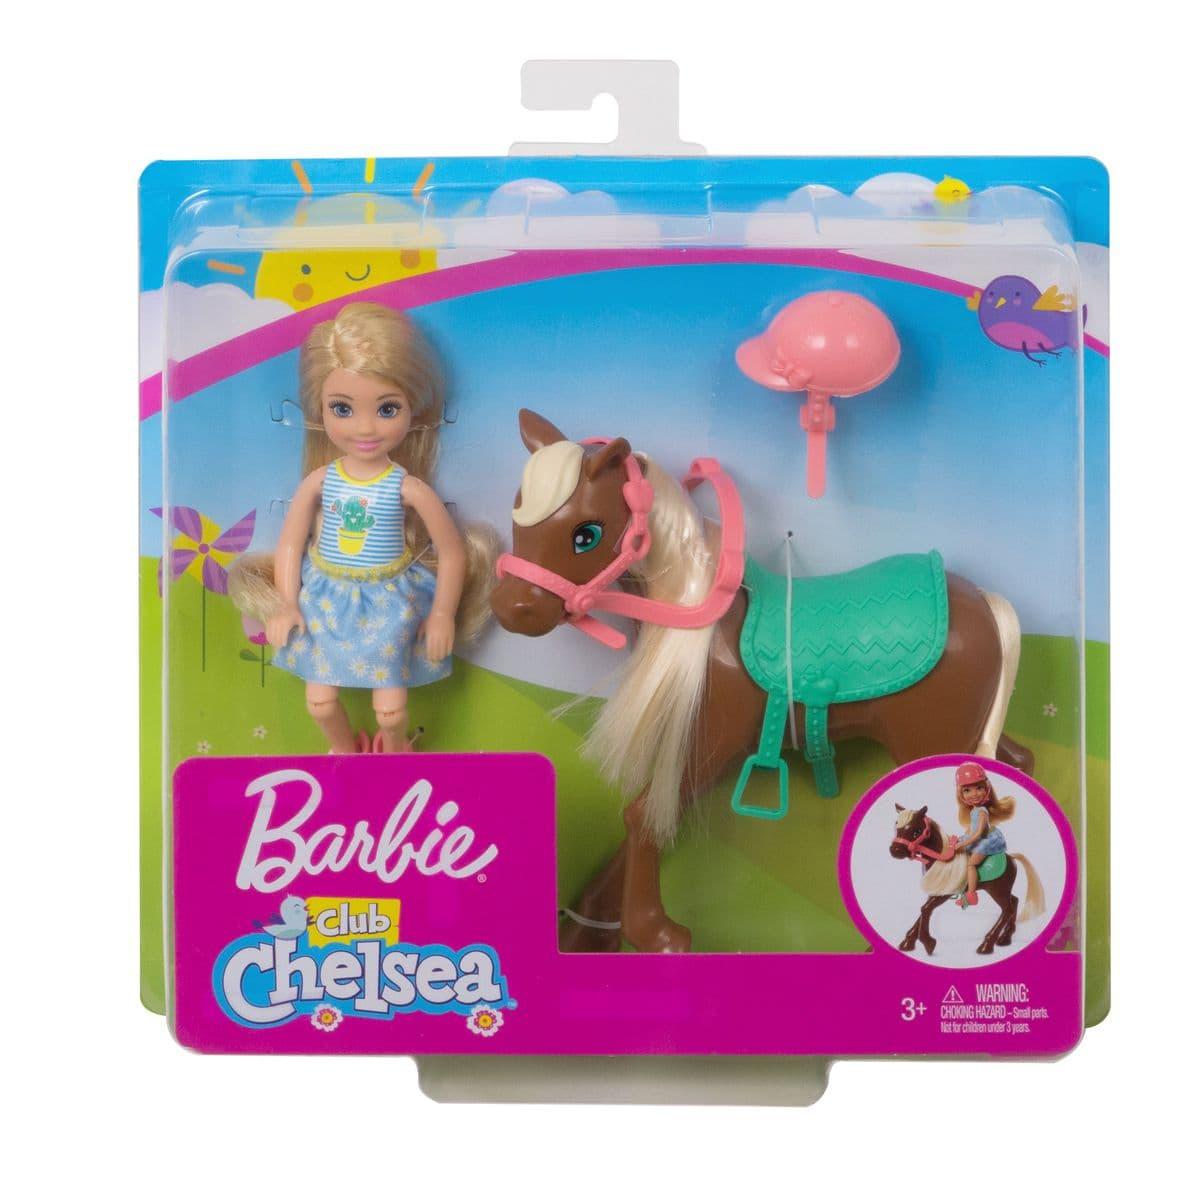 Barbie GHV78 Chelsea & Pony